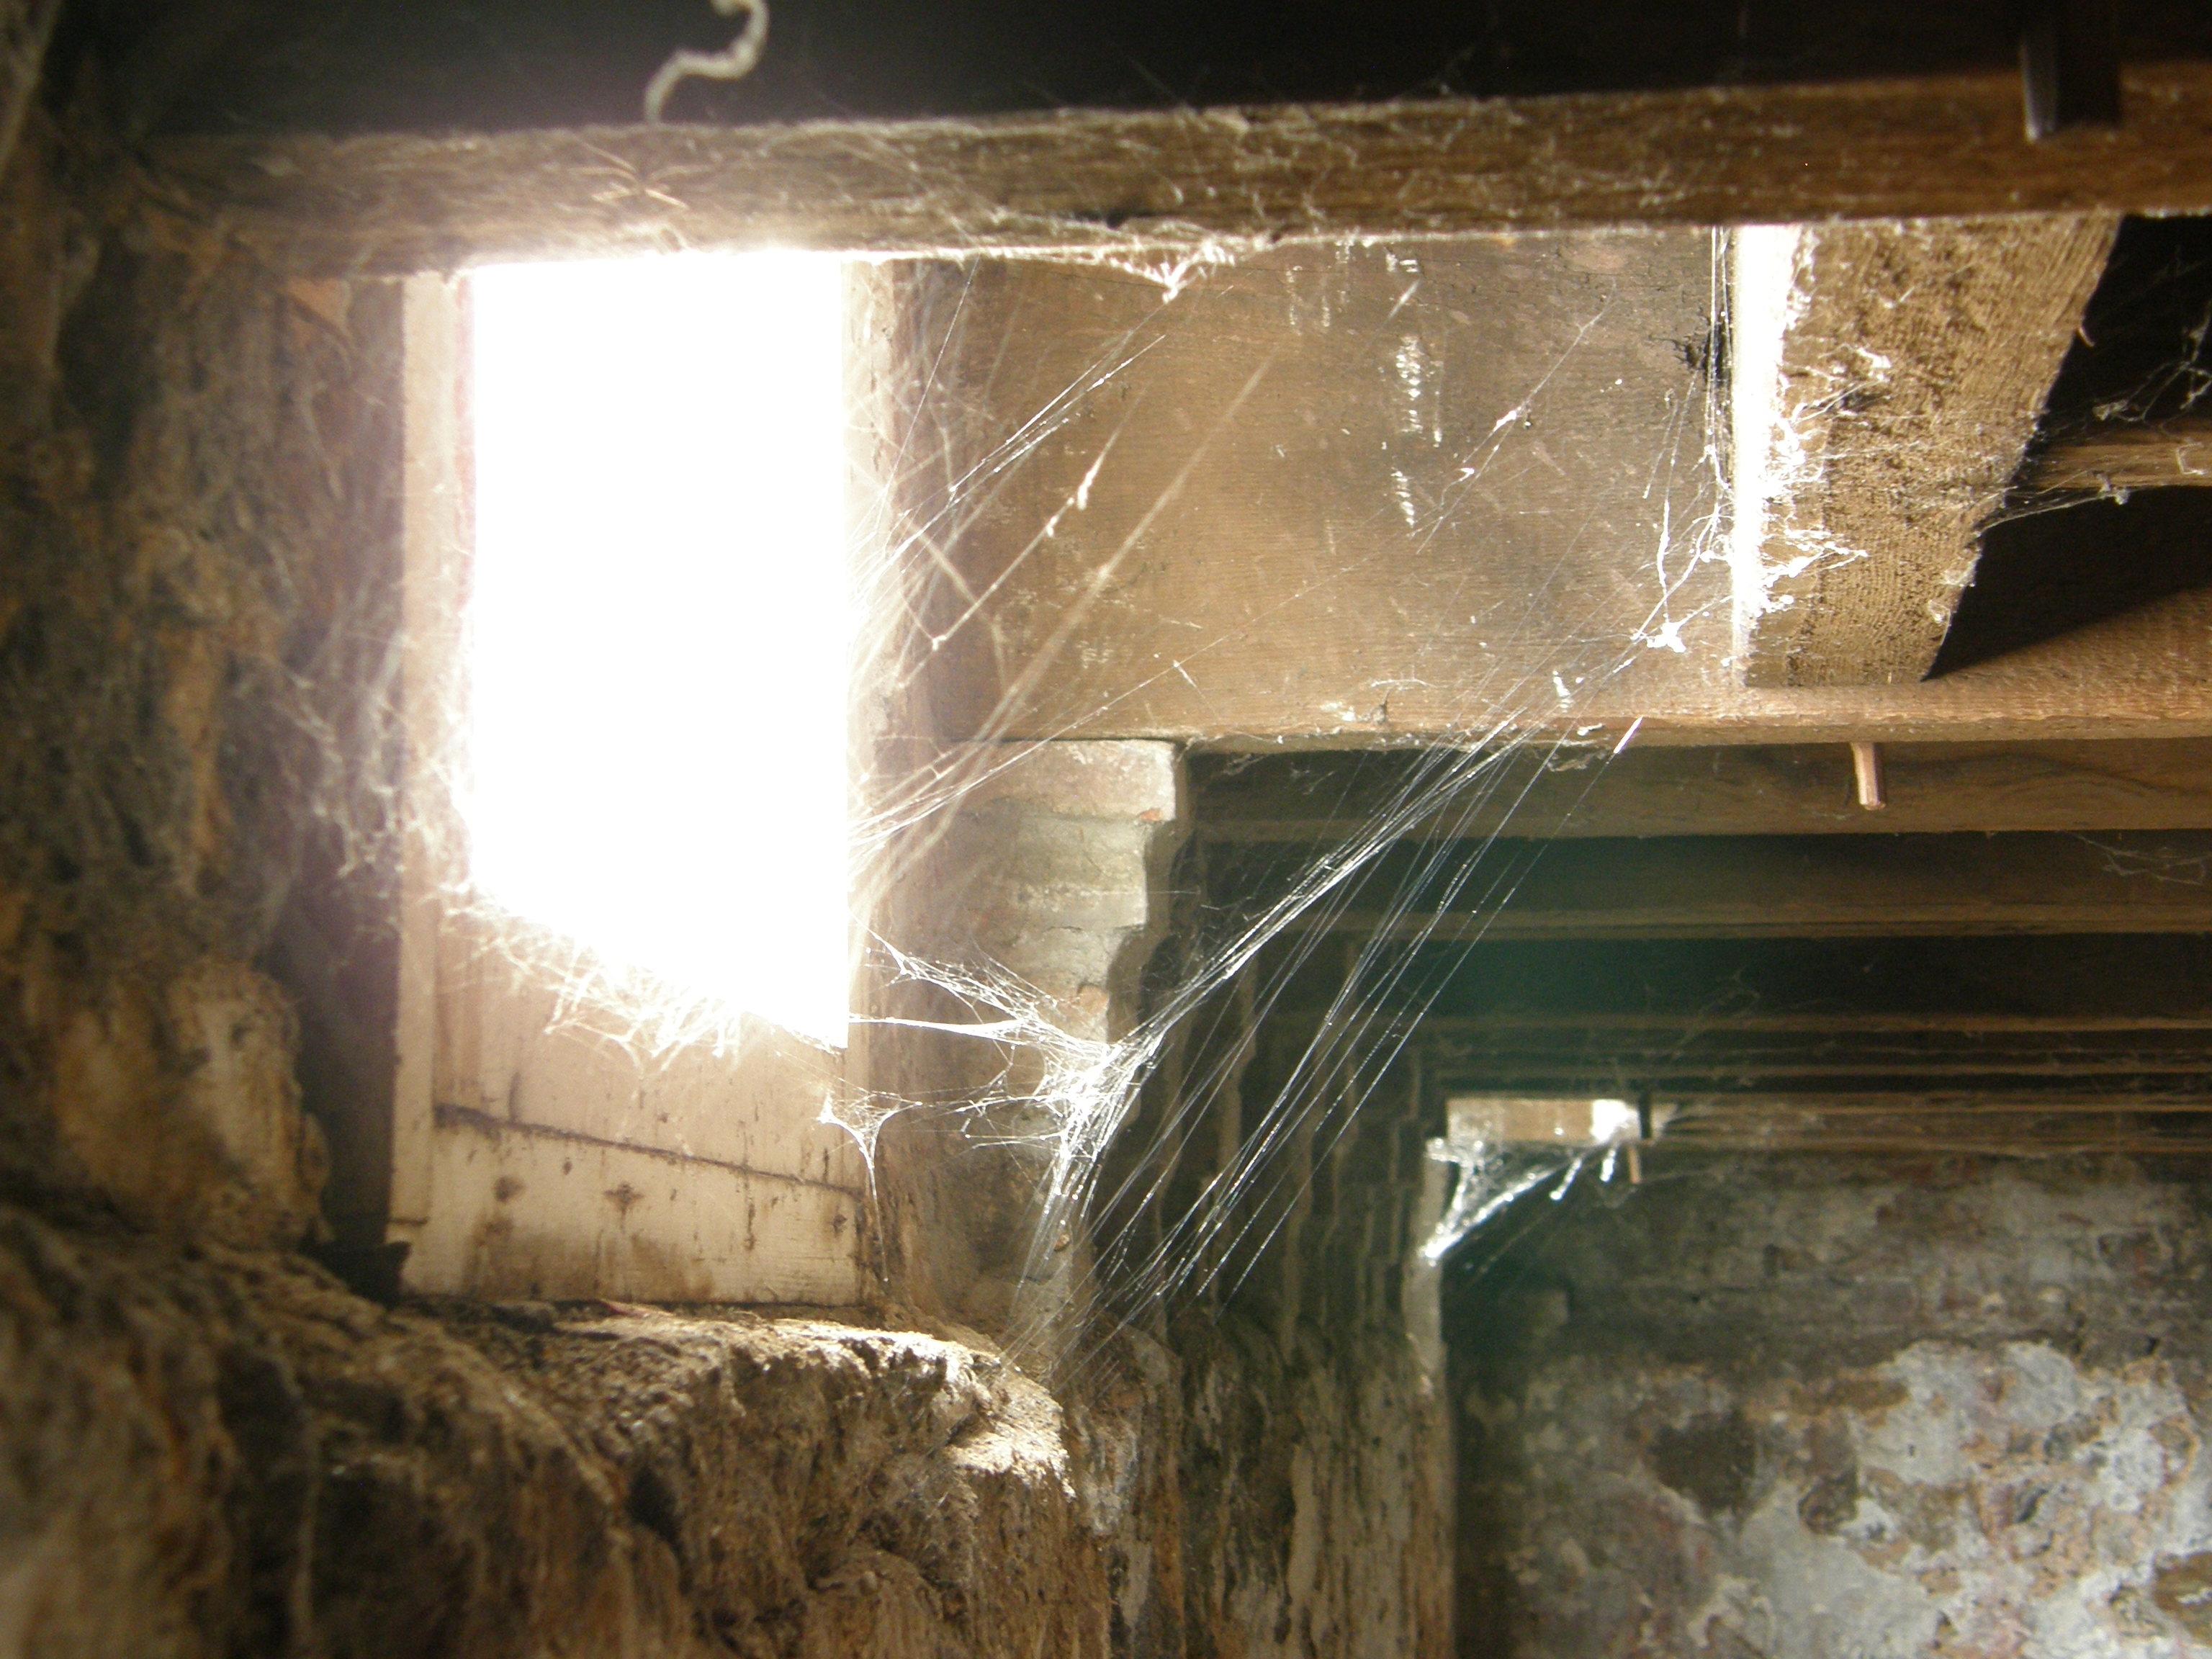 creepy basement criminal case. Creepy spiderwebs in basement Download 2 7 MB Photo Gallery  U S National Park Service